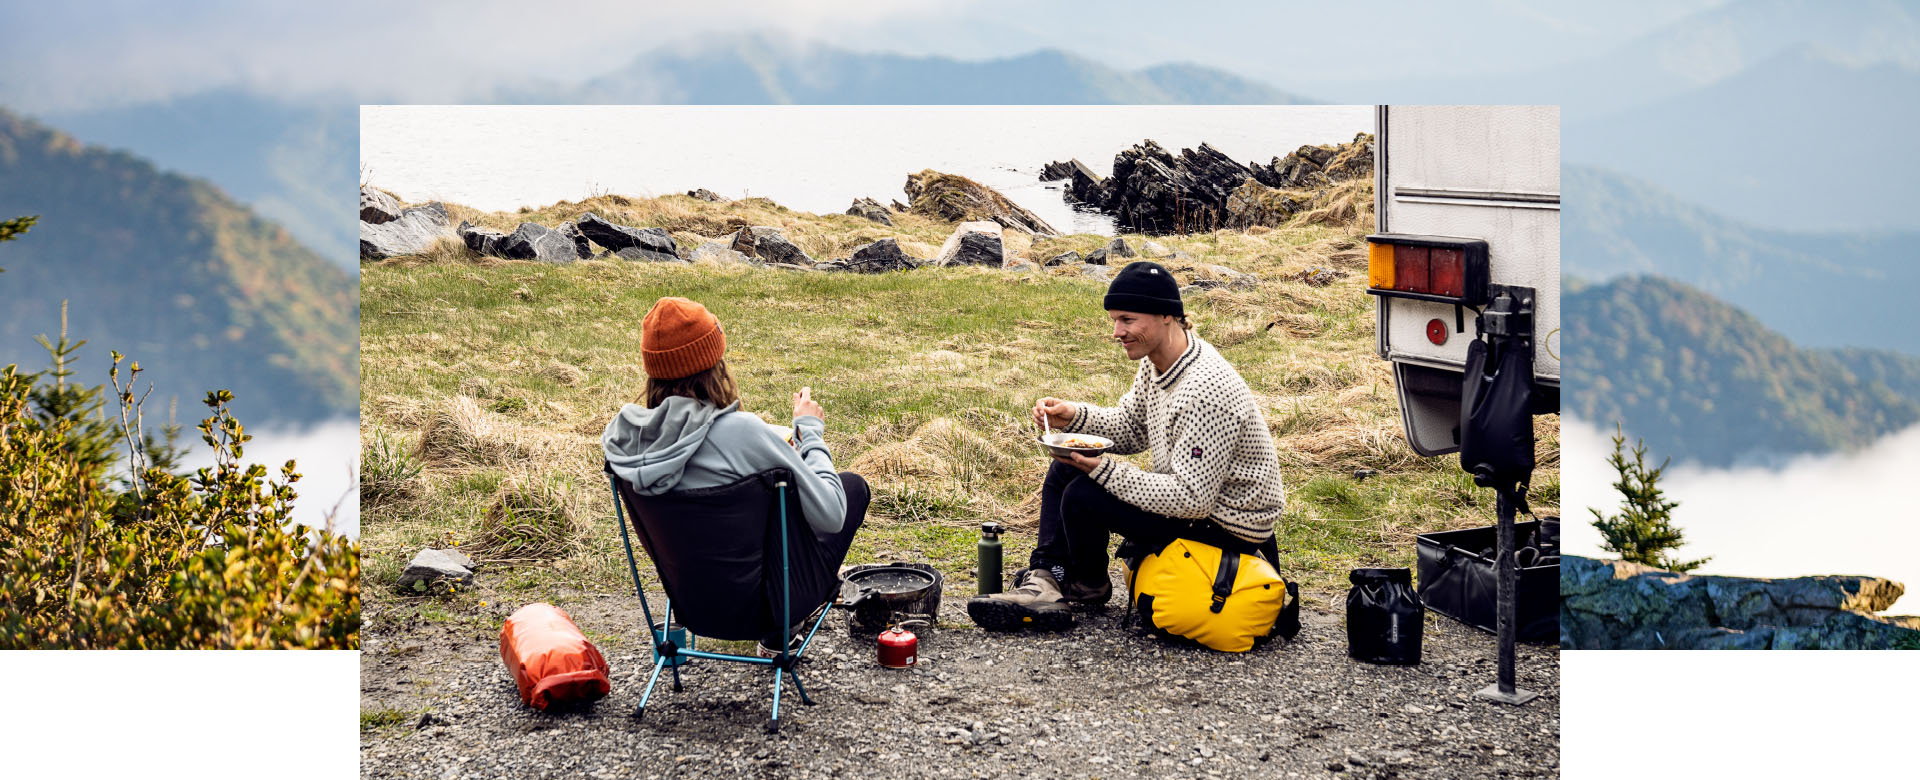 LP_WEB_Camping_Image_04_wide